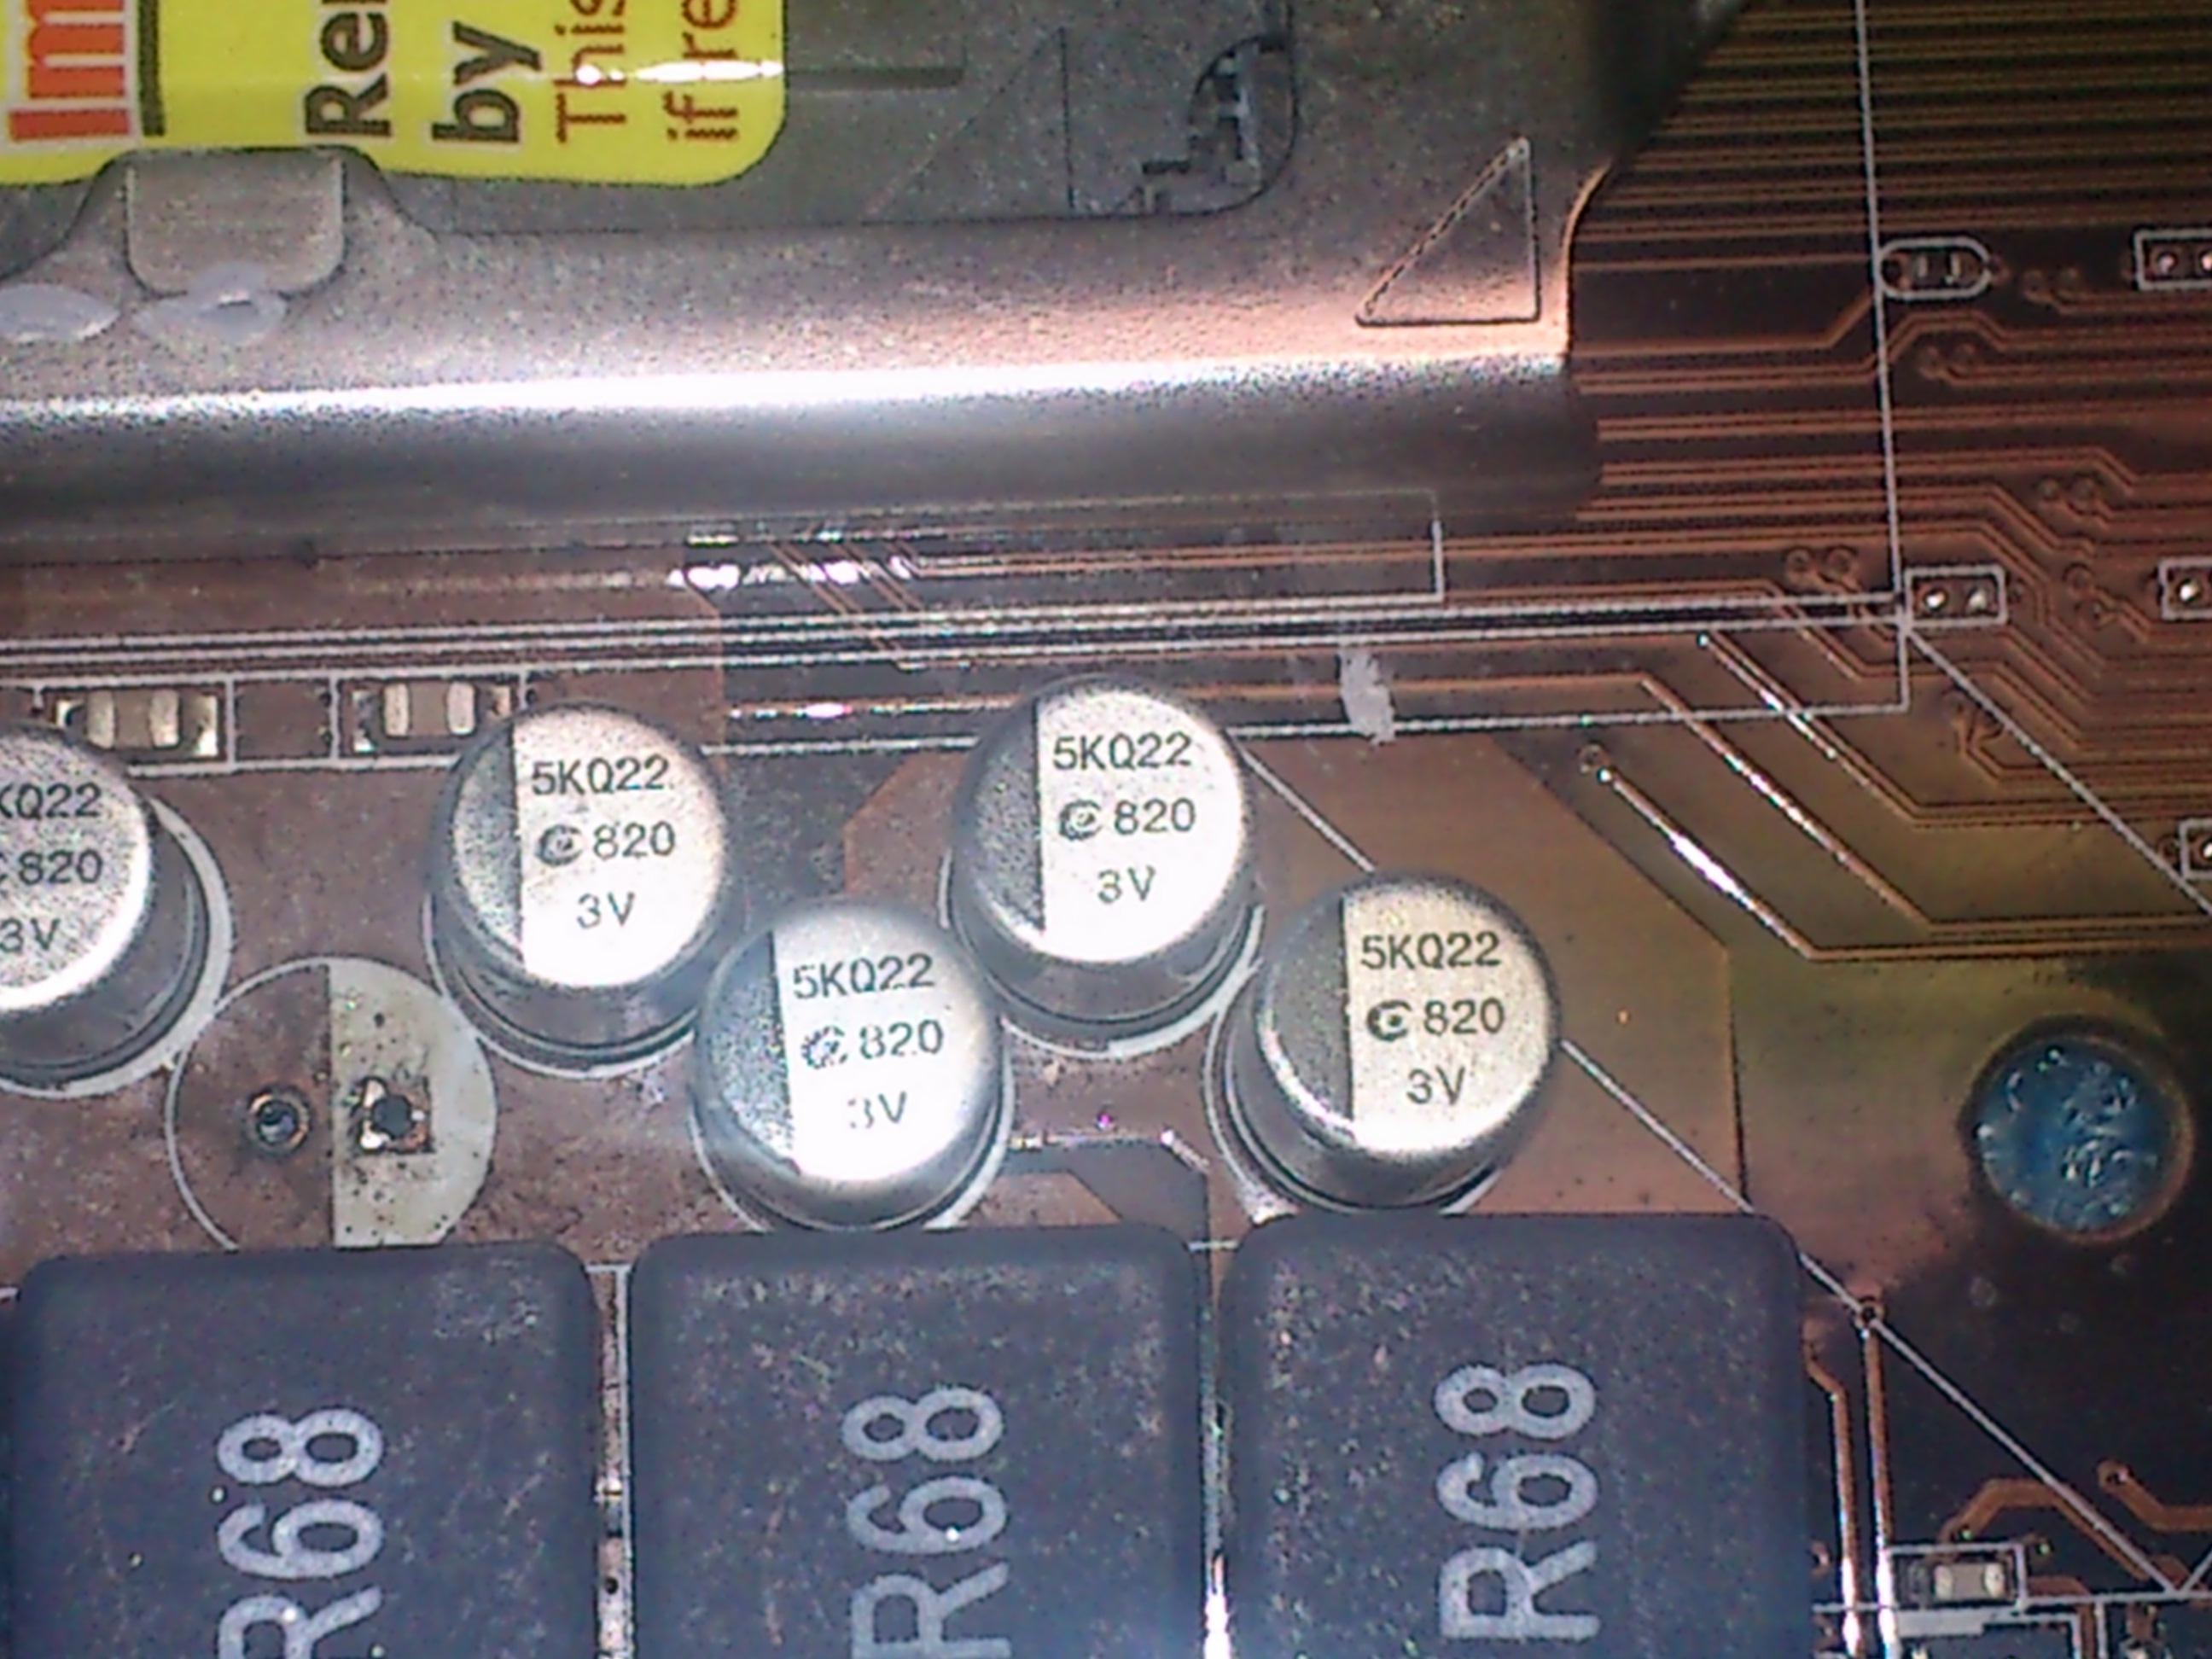 Jaki to rodzaj kondensatora